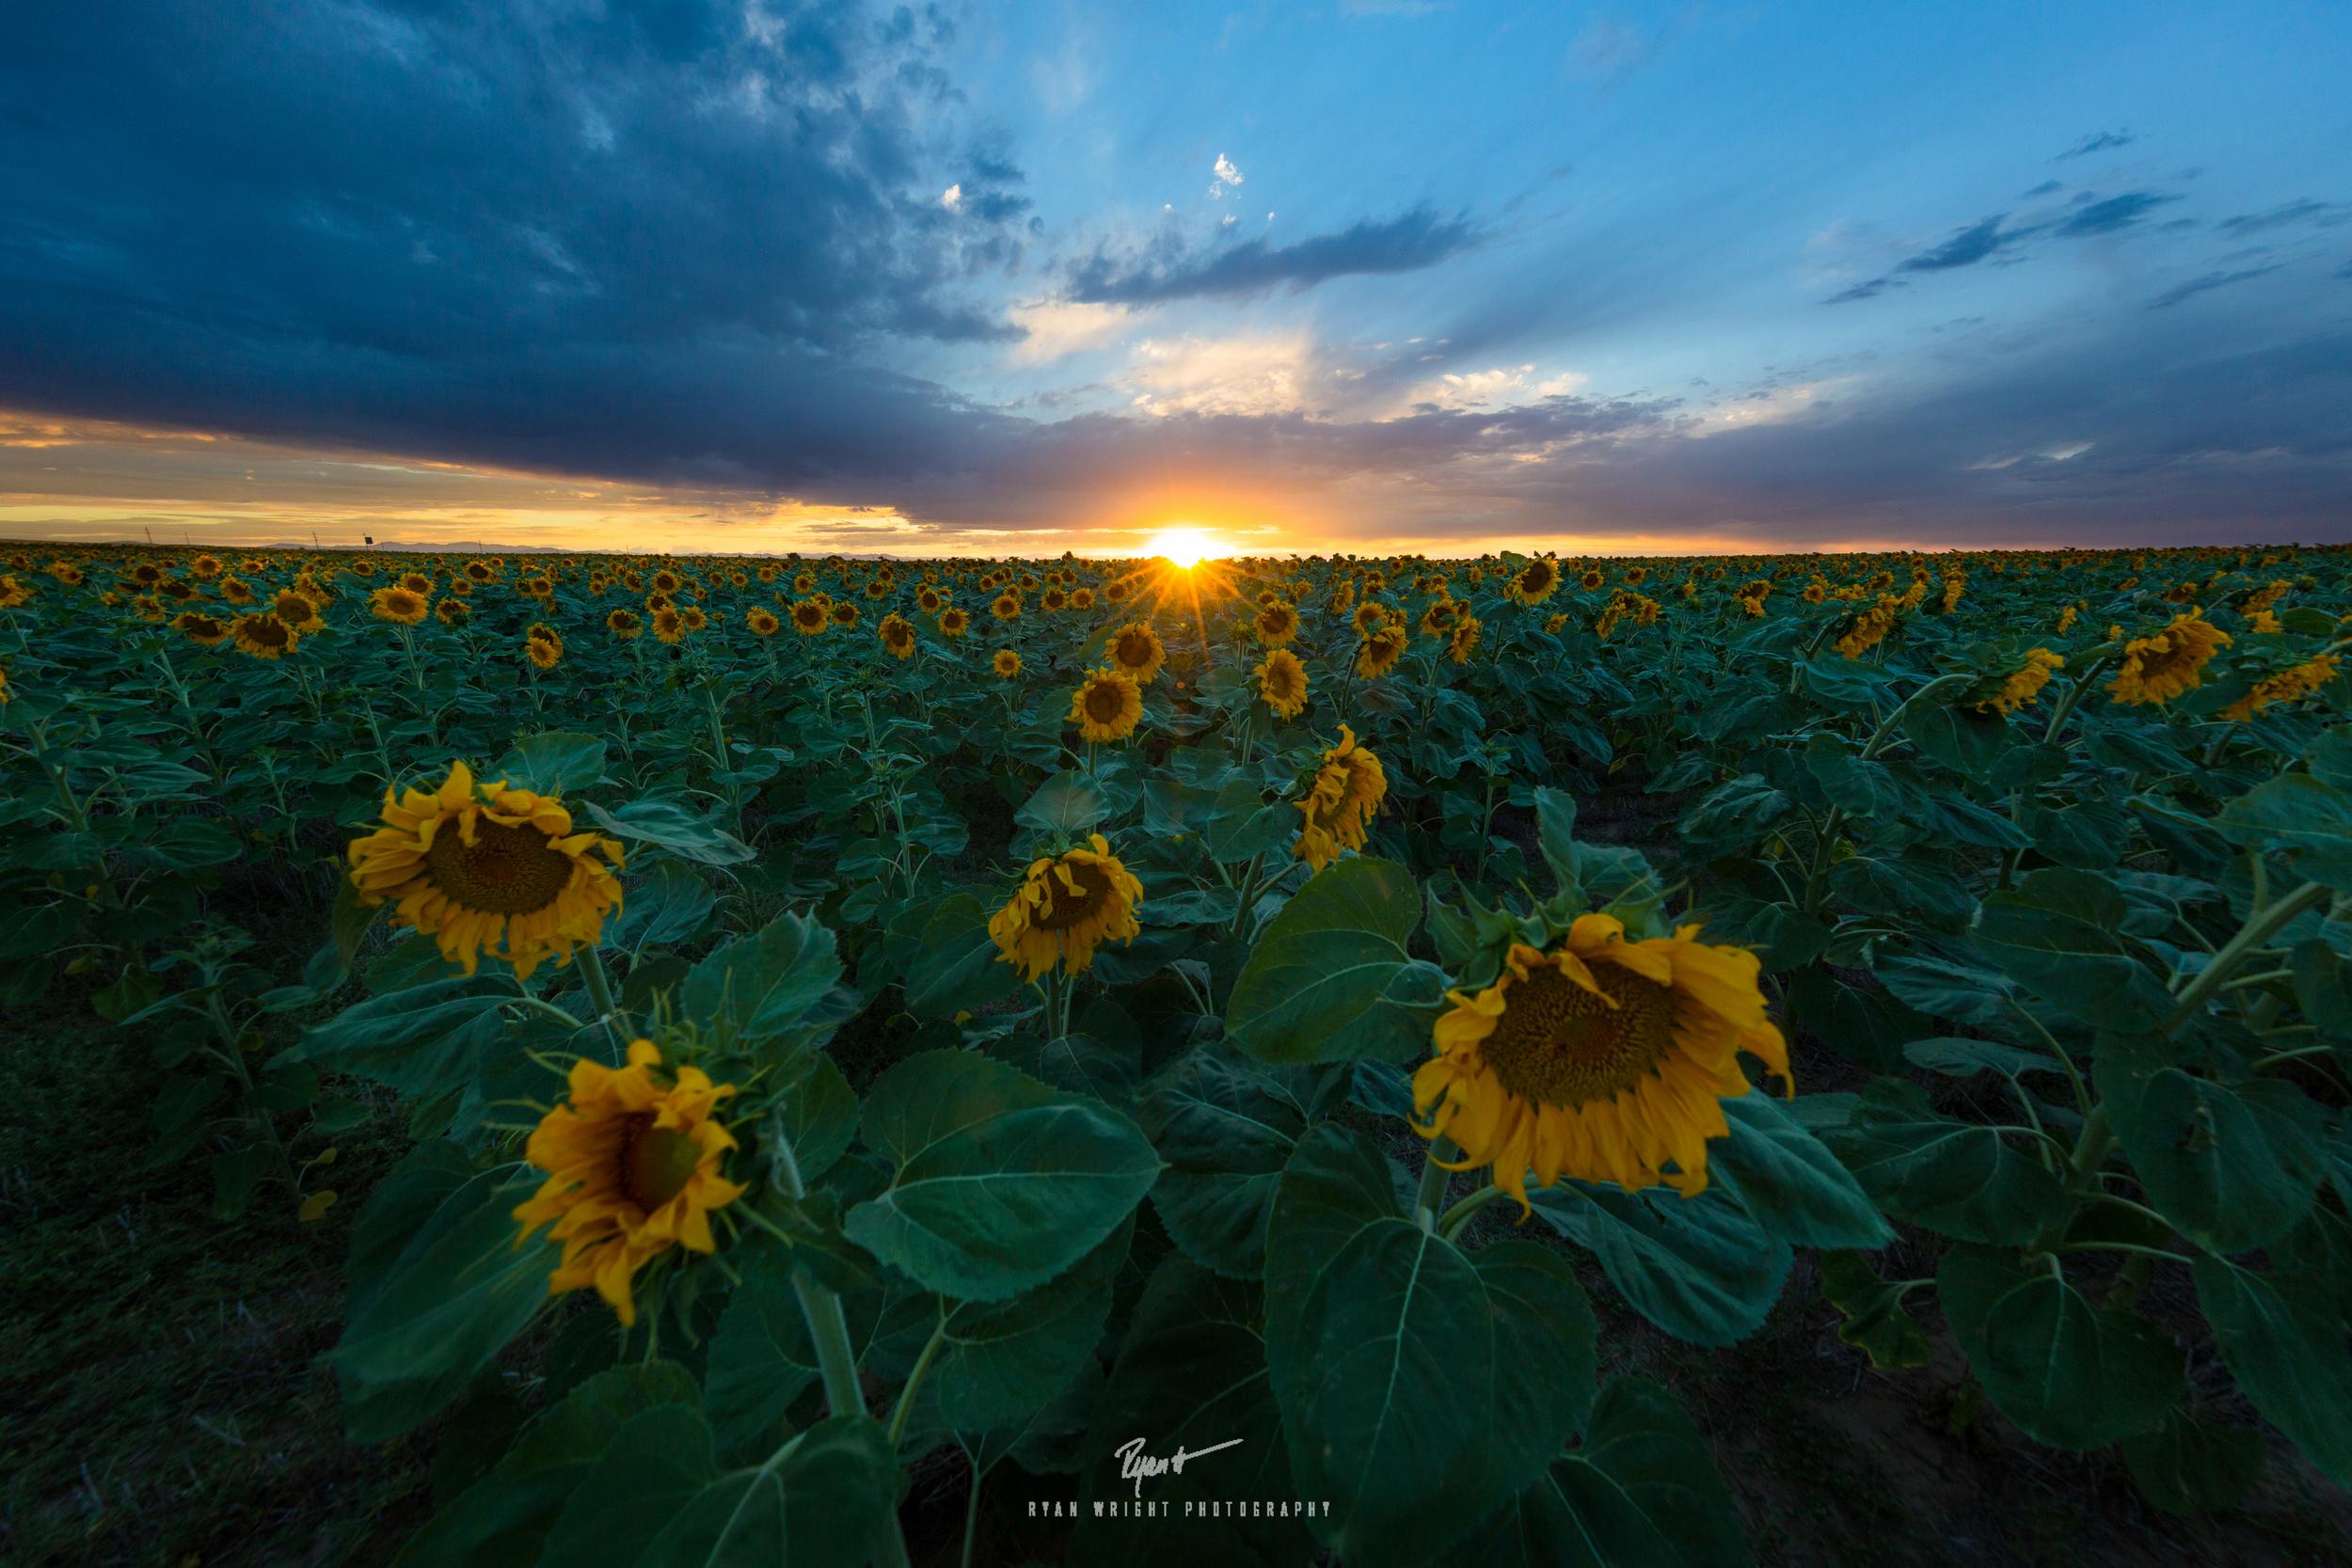 denver-international-airport-sunflowers.jpg